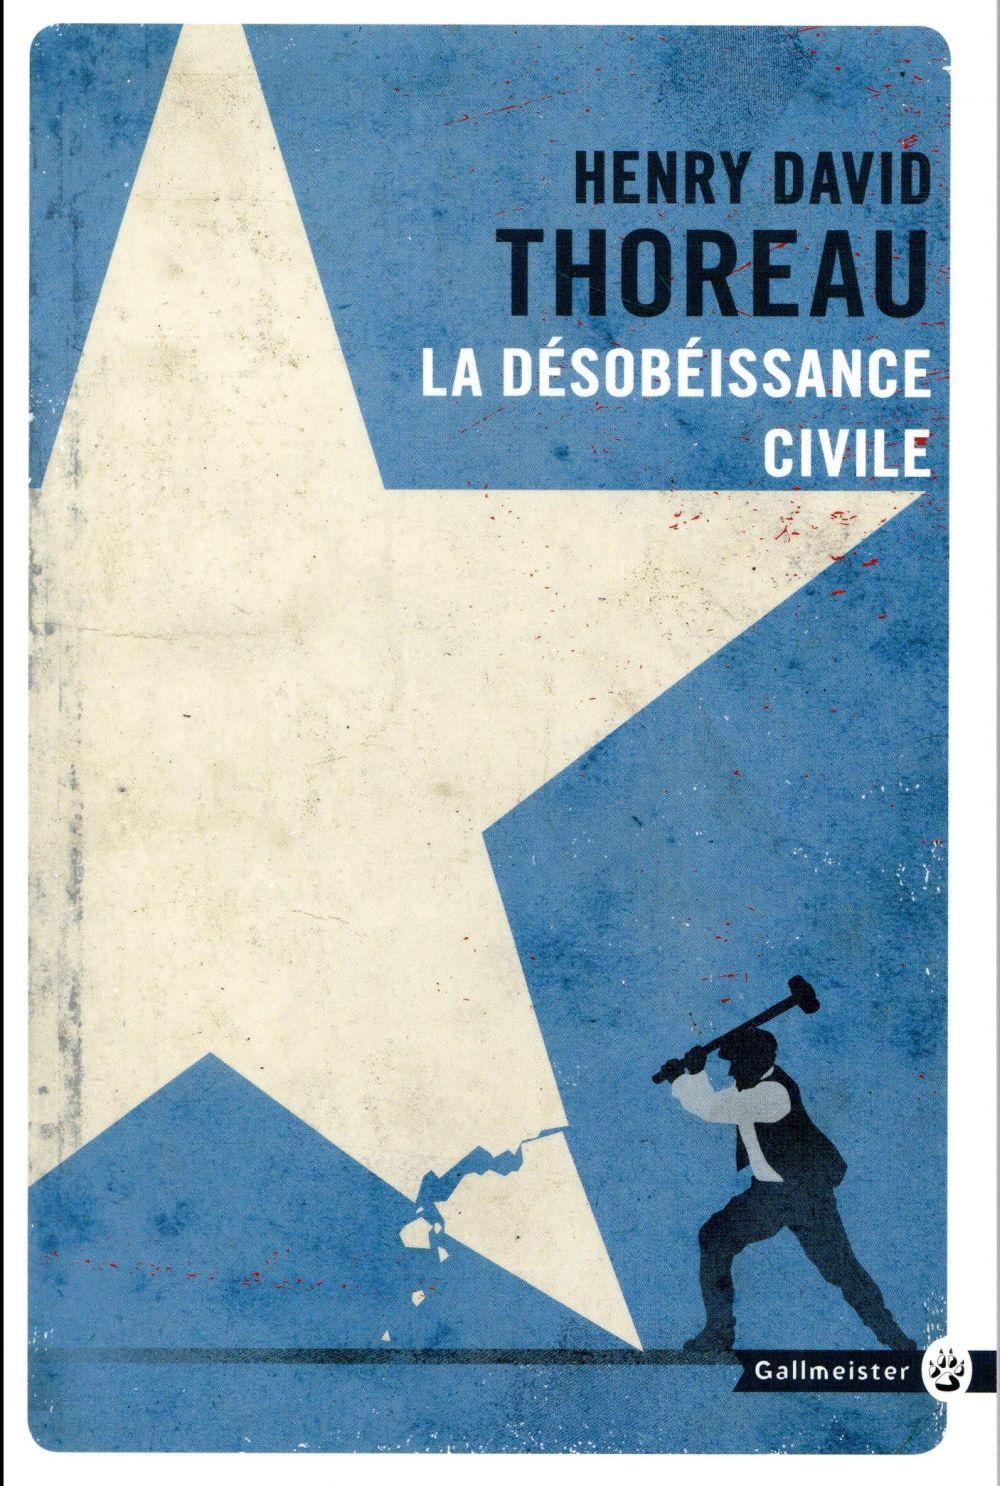 LA DESOBEISSANCE CIVILE Thoreau Henry David Gallmeister